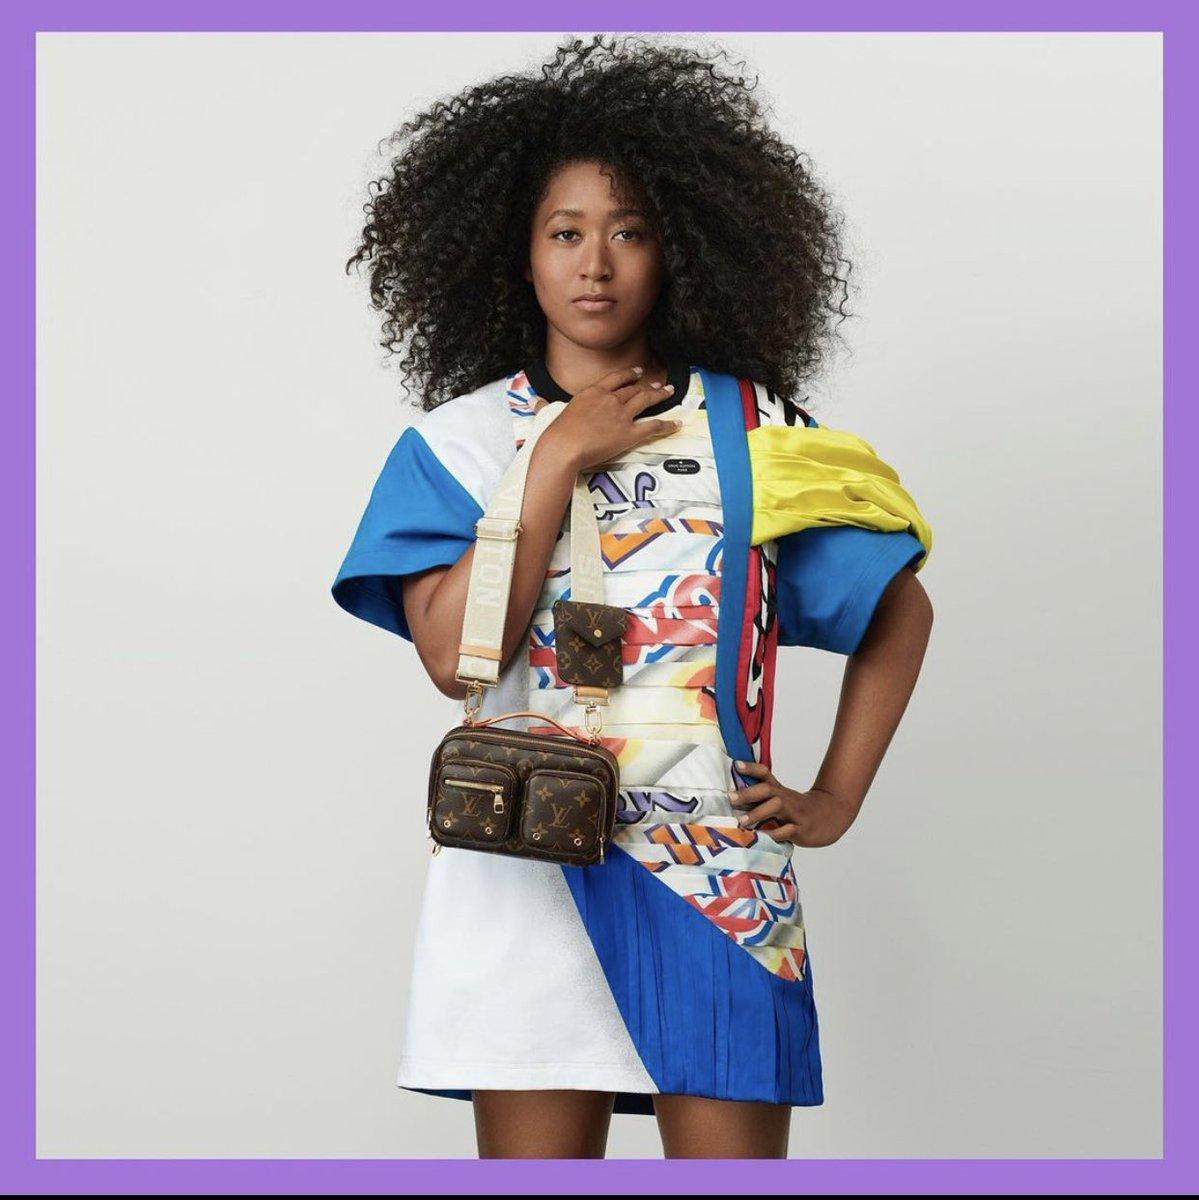 Replying to @revolttv: Congrats to #NaomiOsaka, she is now #LouisVuitton's newest brand ambassador. @naomiosaka 👏🏿👏🏿